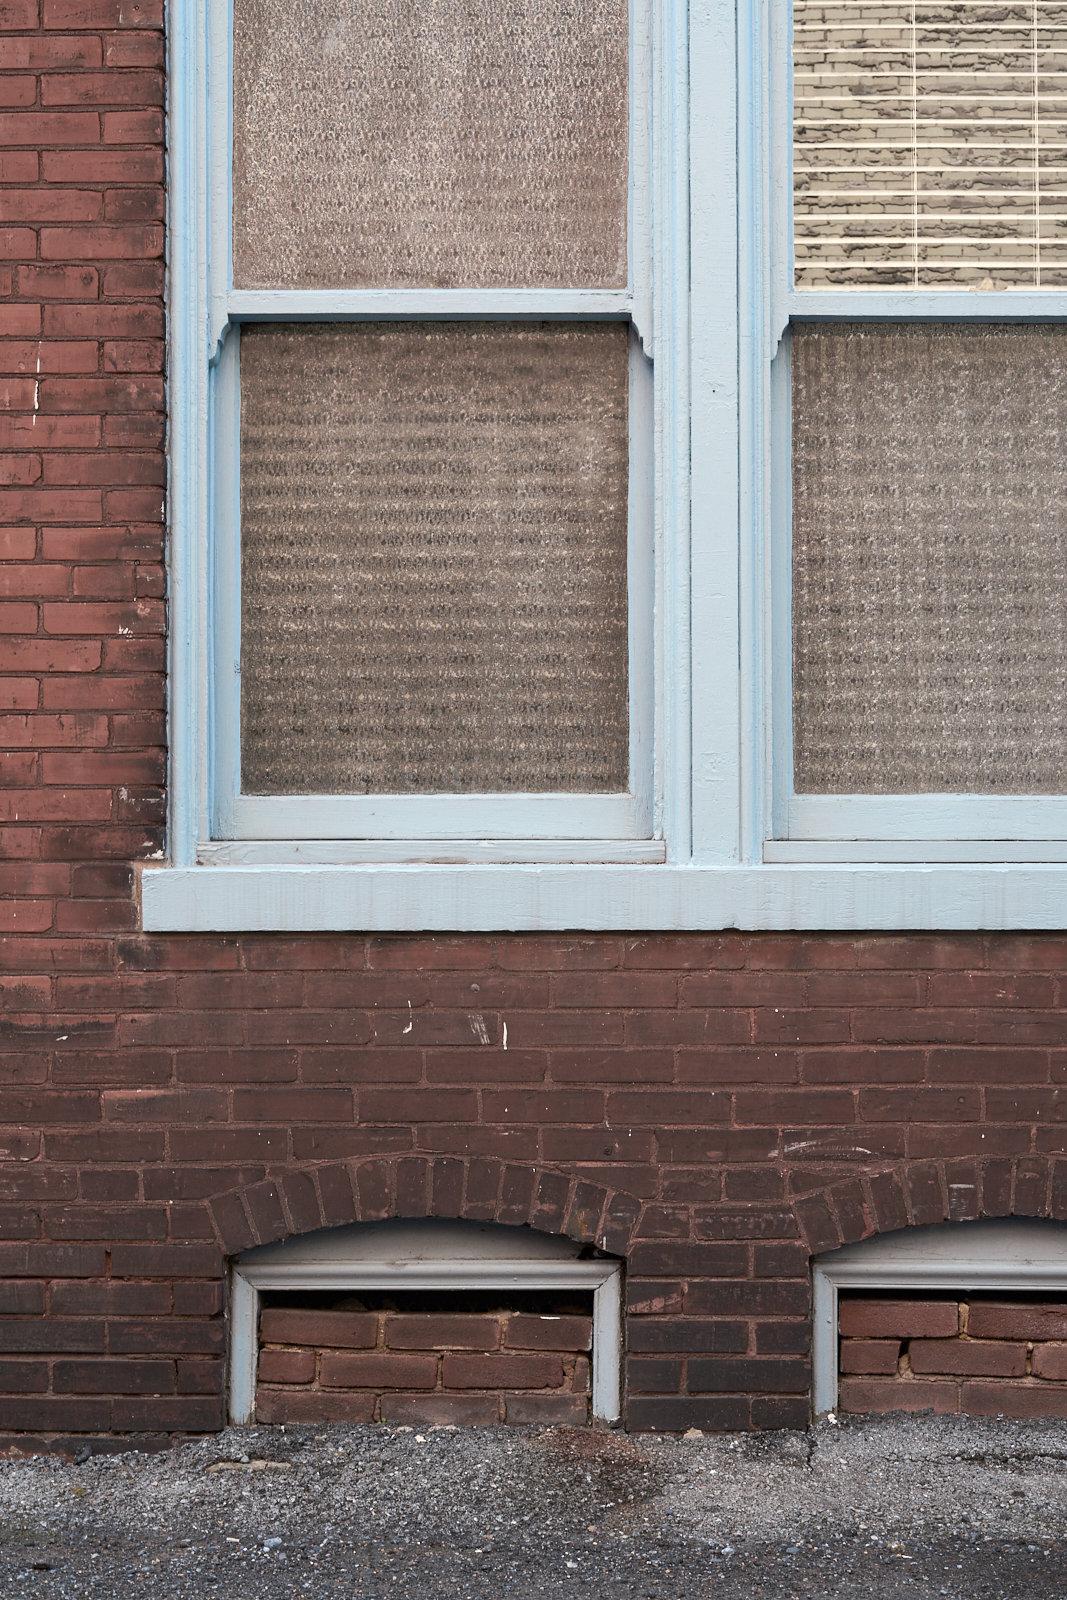 Windows - Harrisburg, Pennsylvania - fine art street photography